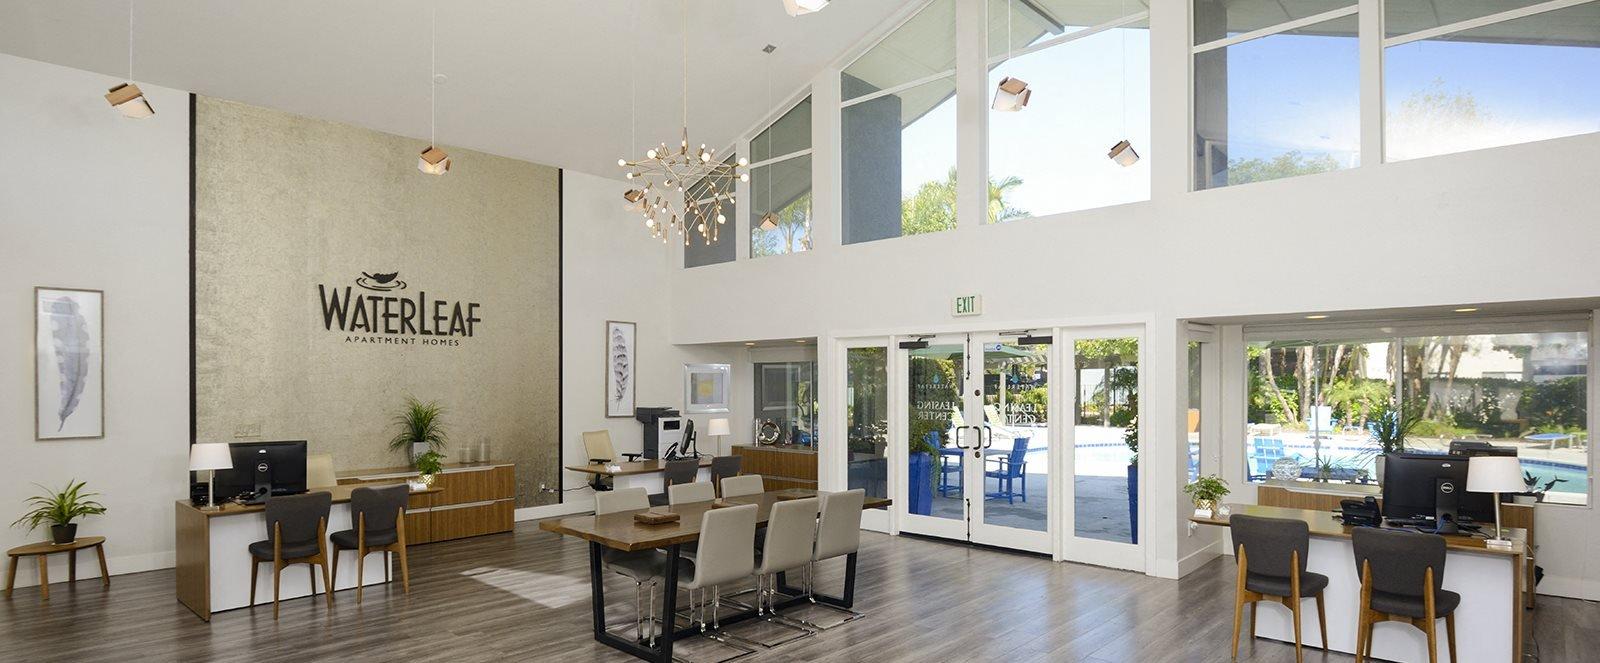 Apartments for Rent in Vista, CA | Waterleaf Apartments